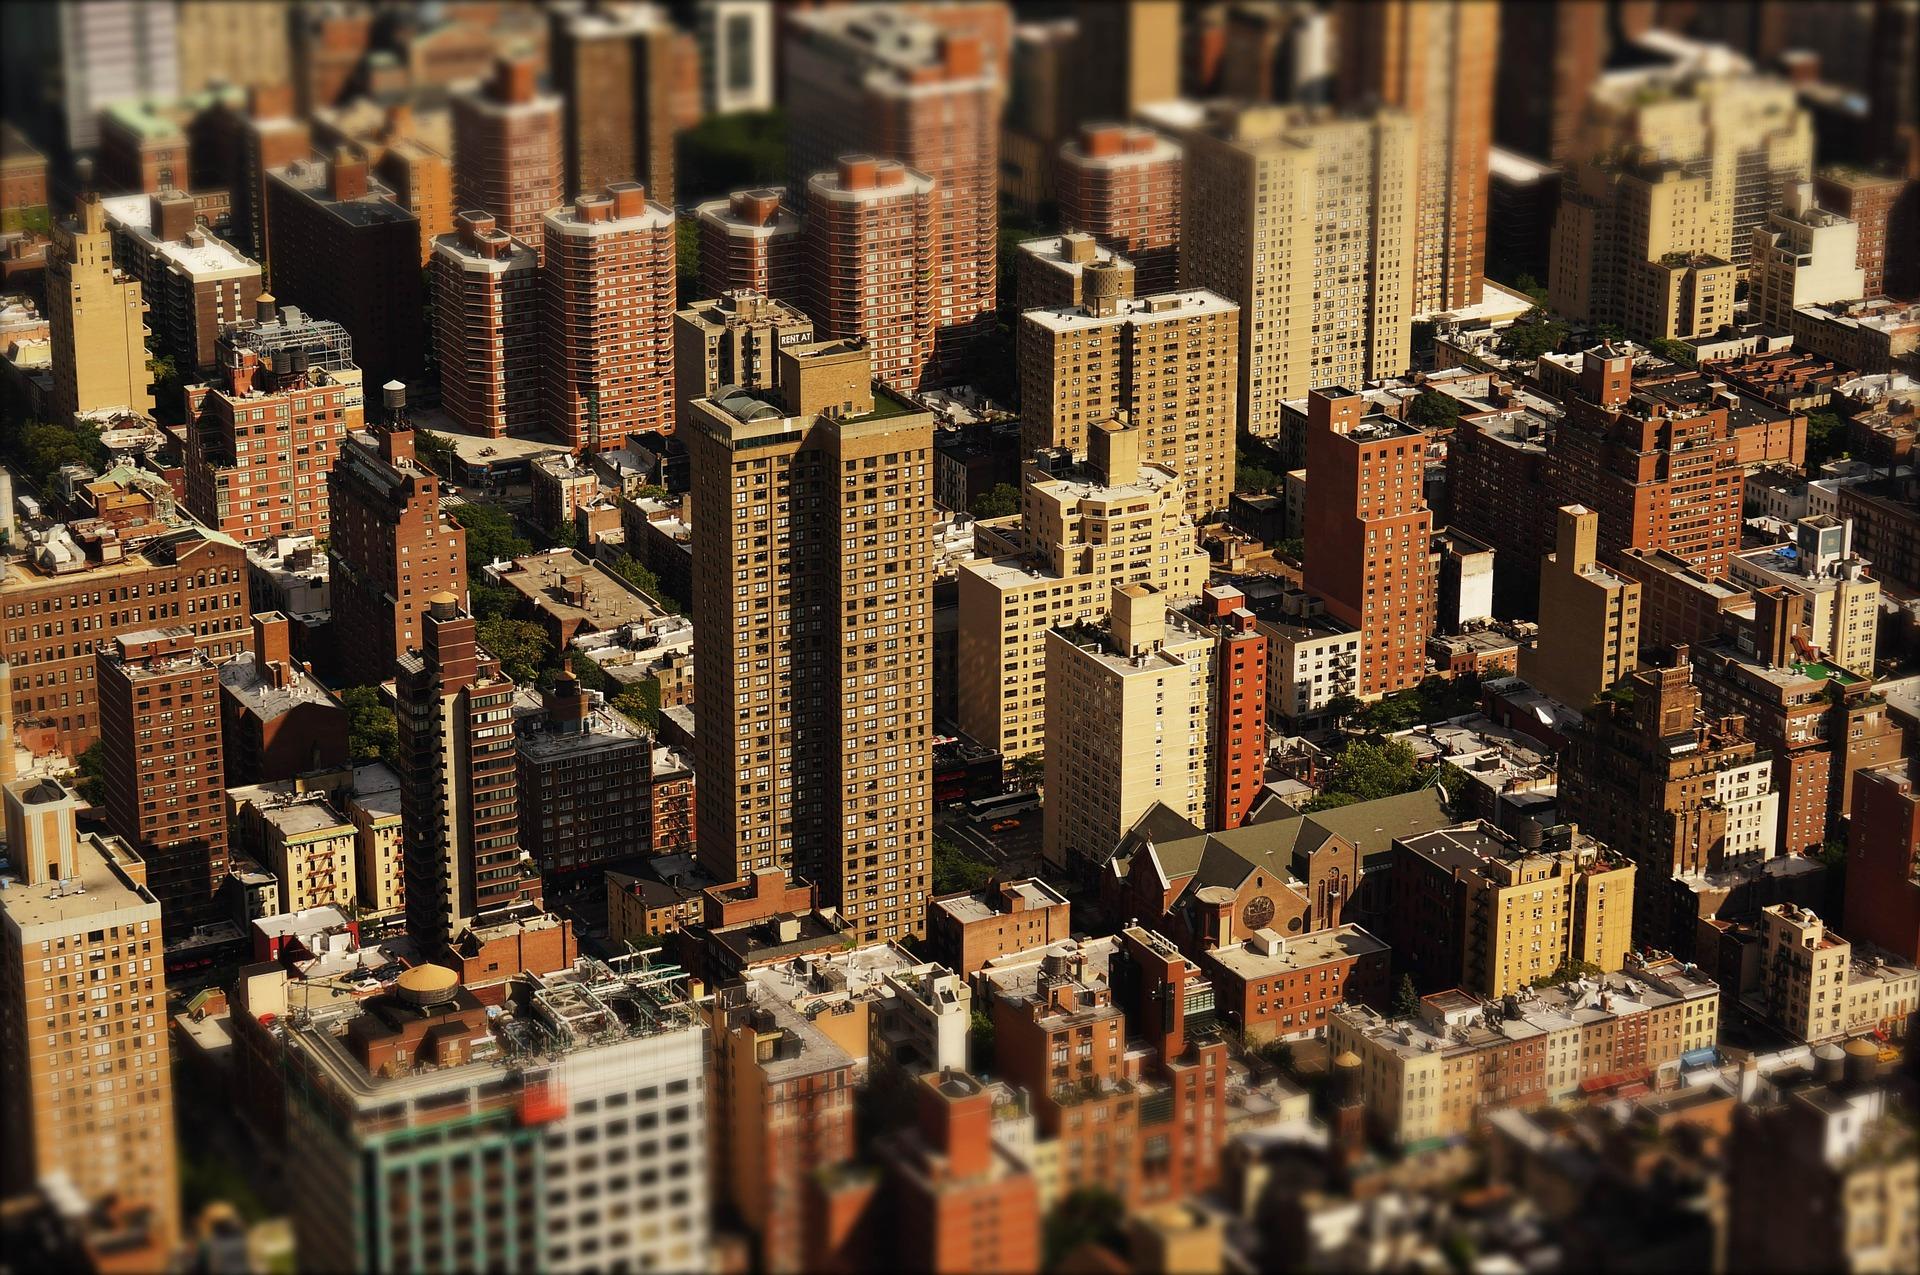 skyscraper-450793_1920.jpg